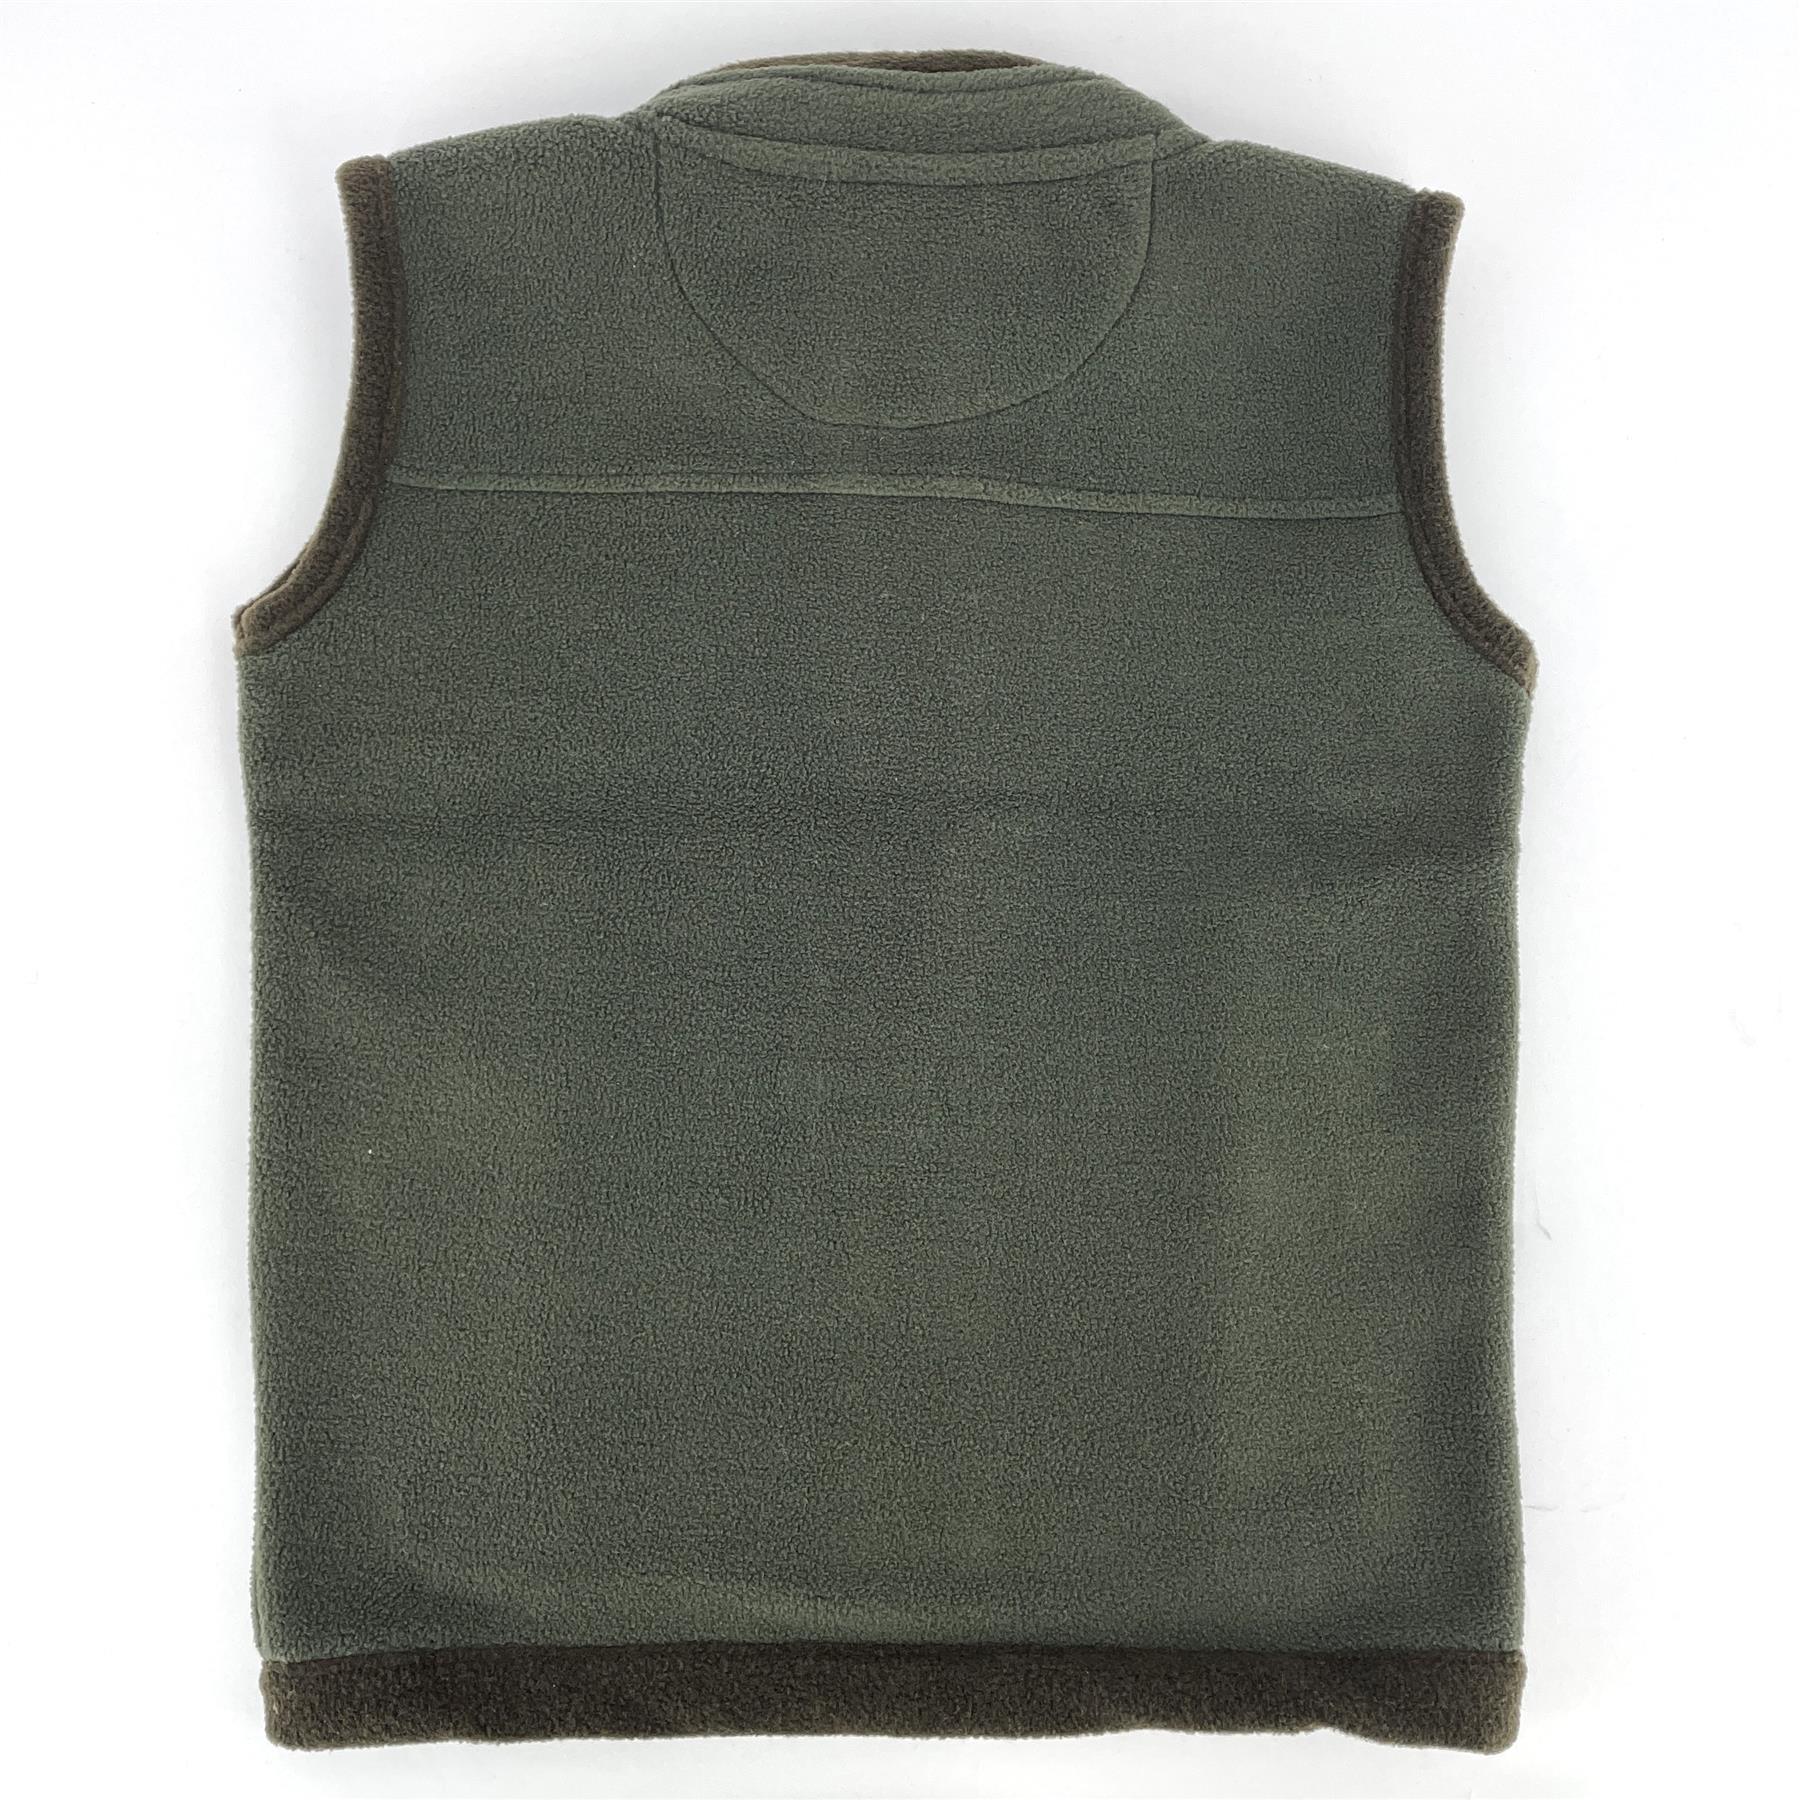 miniatuur 6 - Hazy Blue Kids Angus Pheasant Bodywarmer Boys Girls Gilet Vest Country Fleece